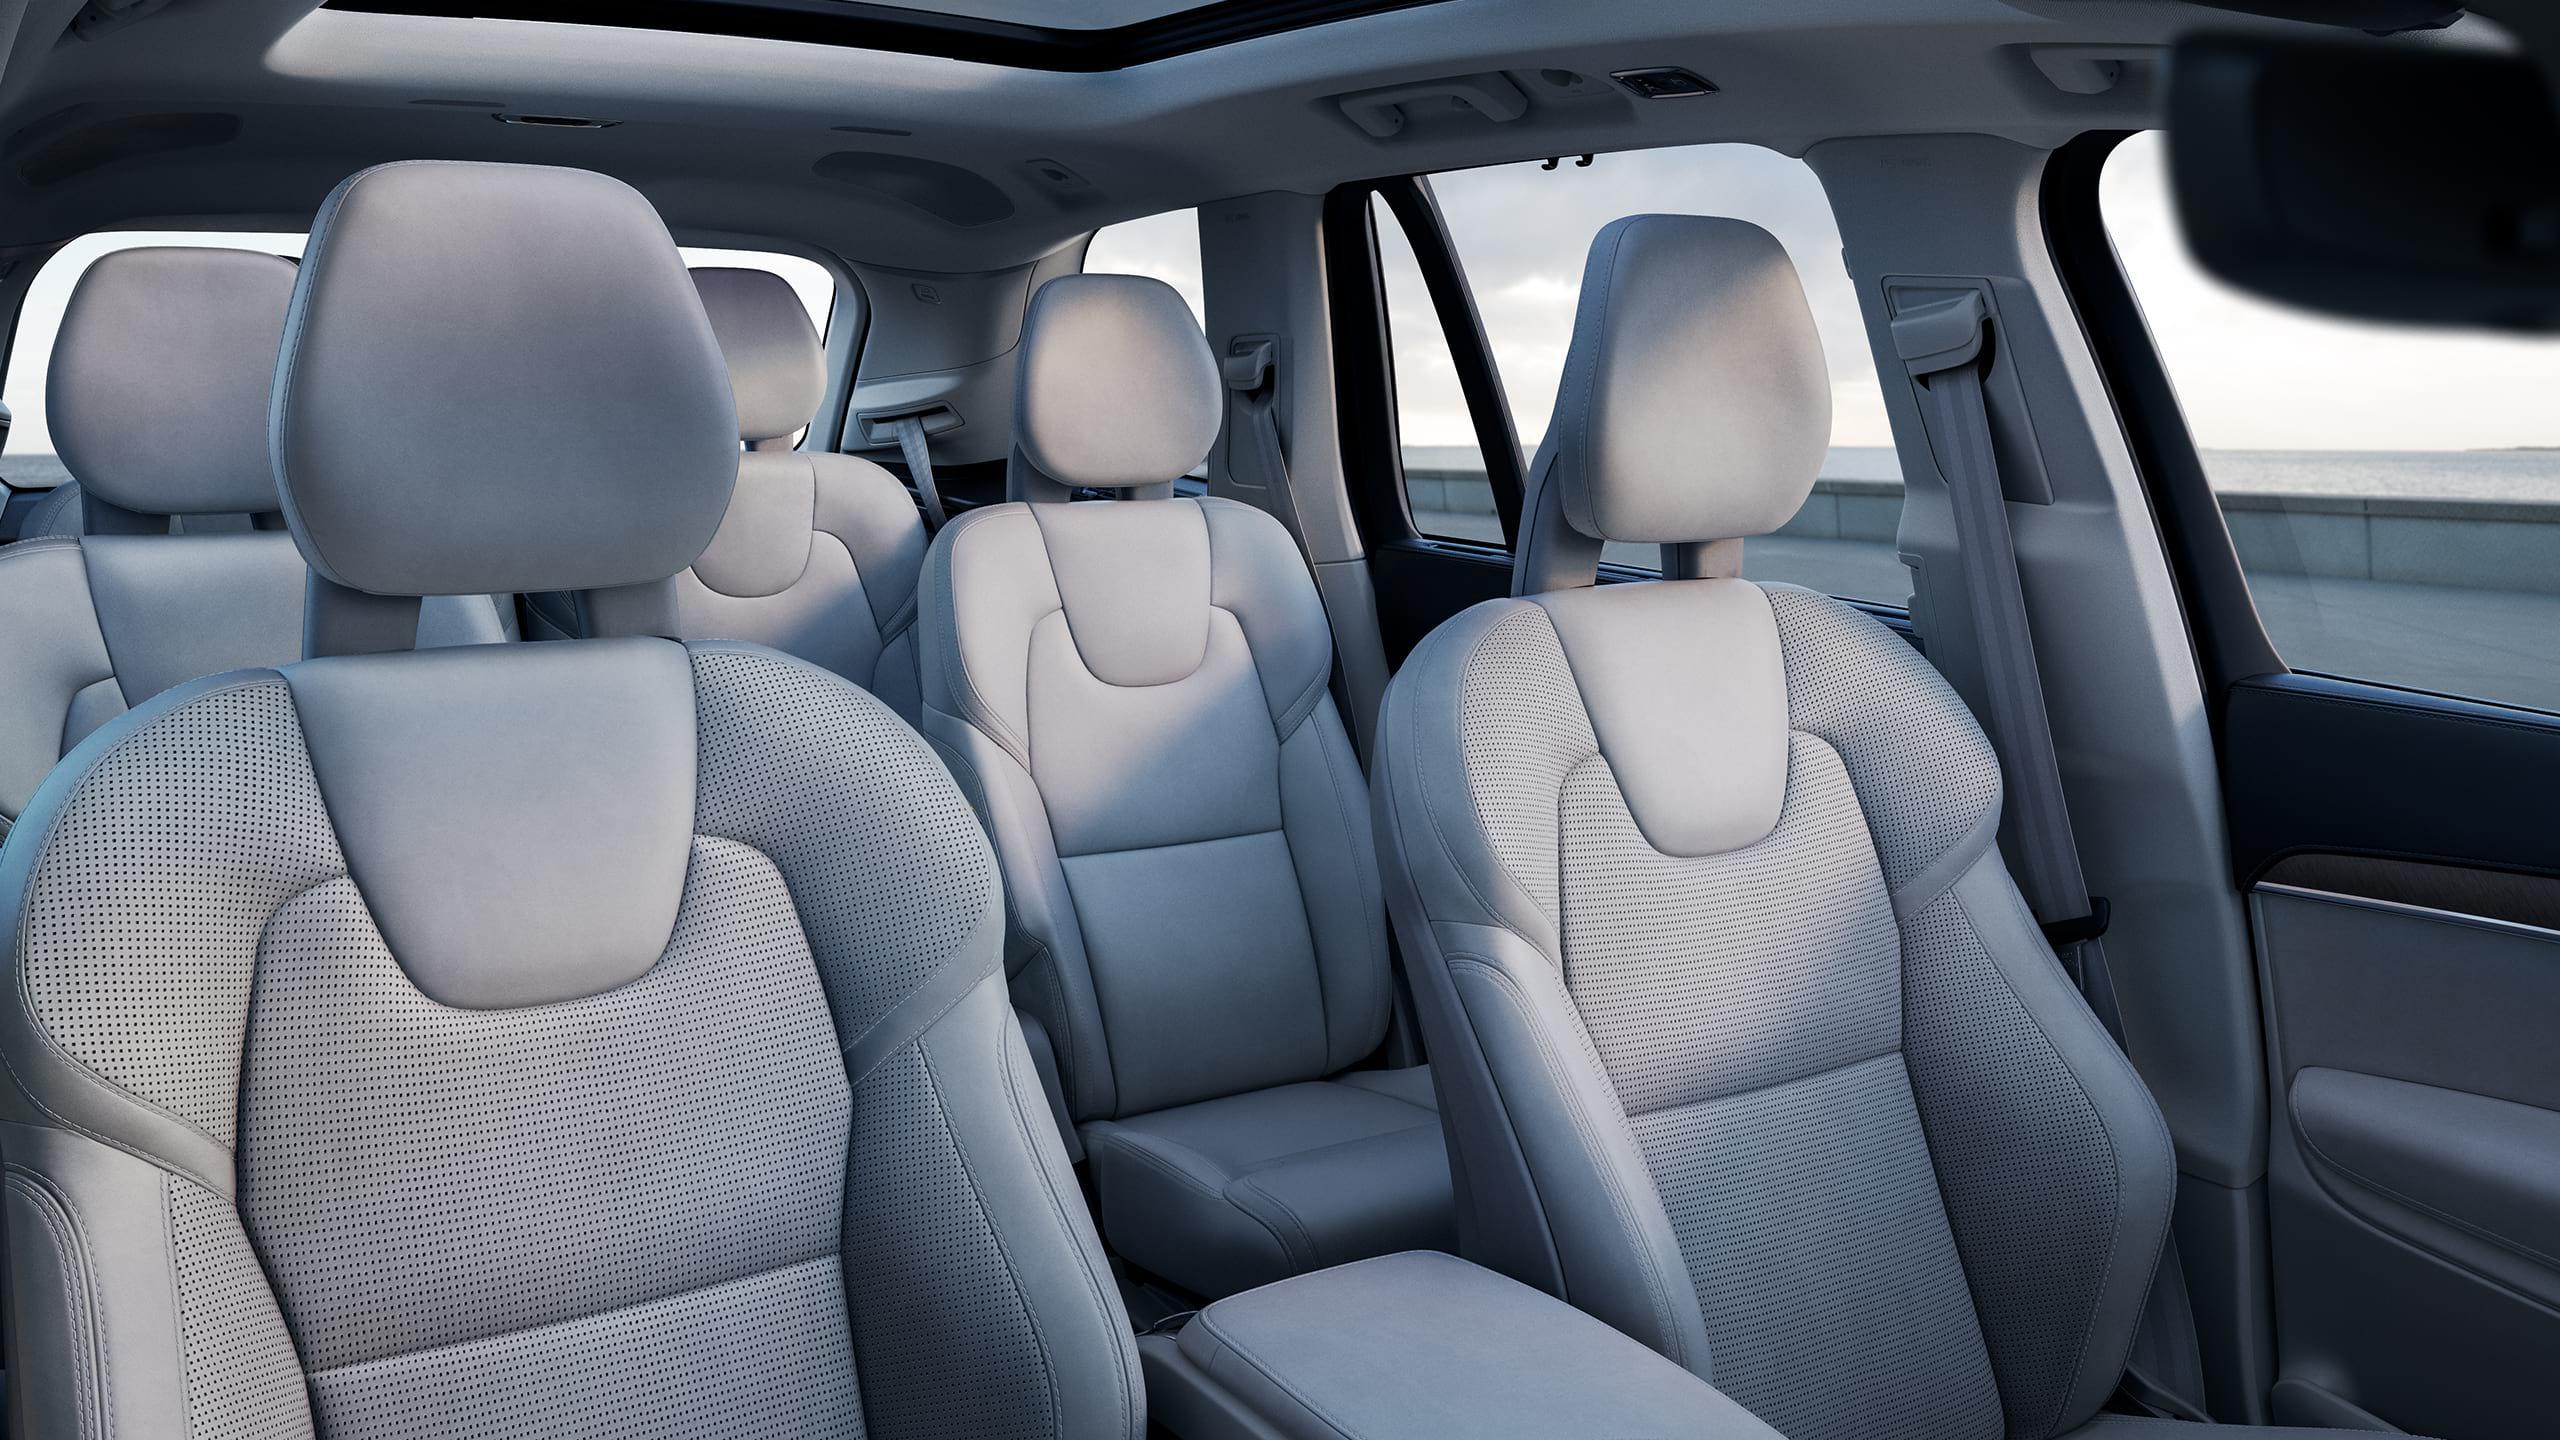 Pohľad do svetlého interiéru Volva XC90 s tromi radmi sedadiel